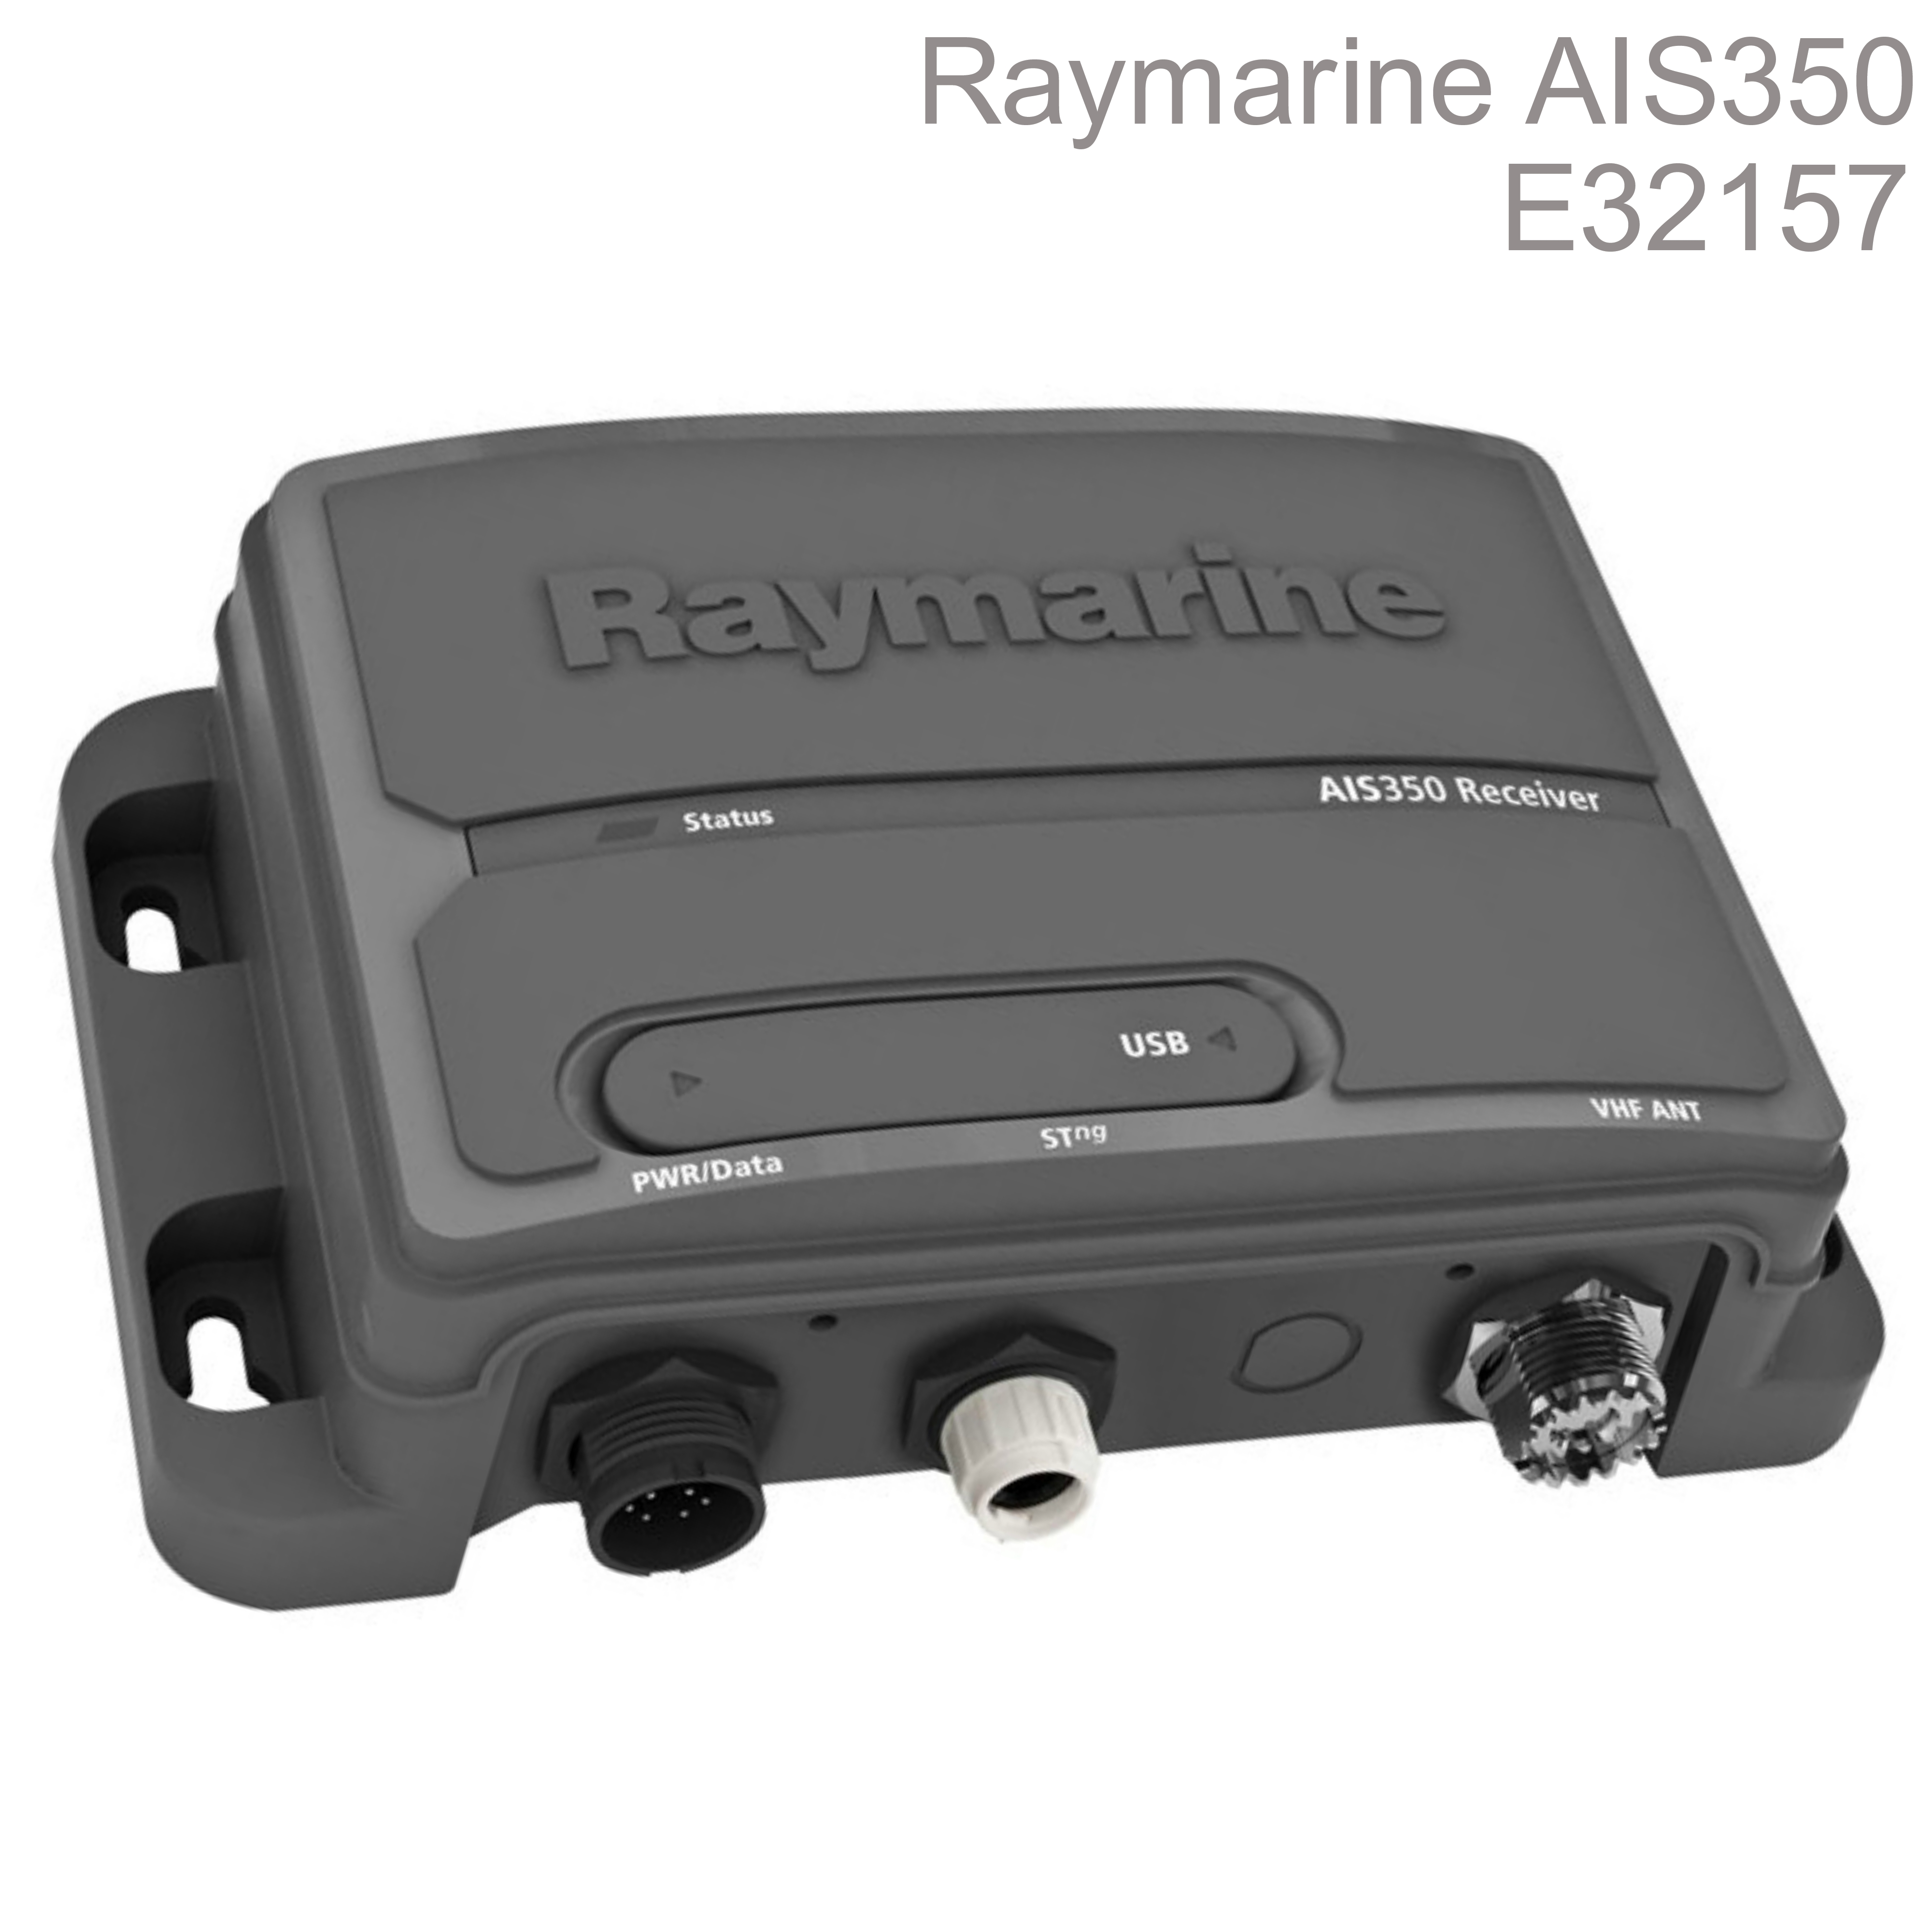 Raymarine-E32157|AIS350 Dual Channel AIS Receiver|USB Port|IPX2|For NMEA/MFD/VHF